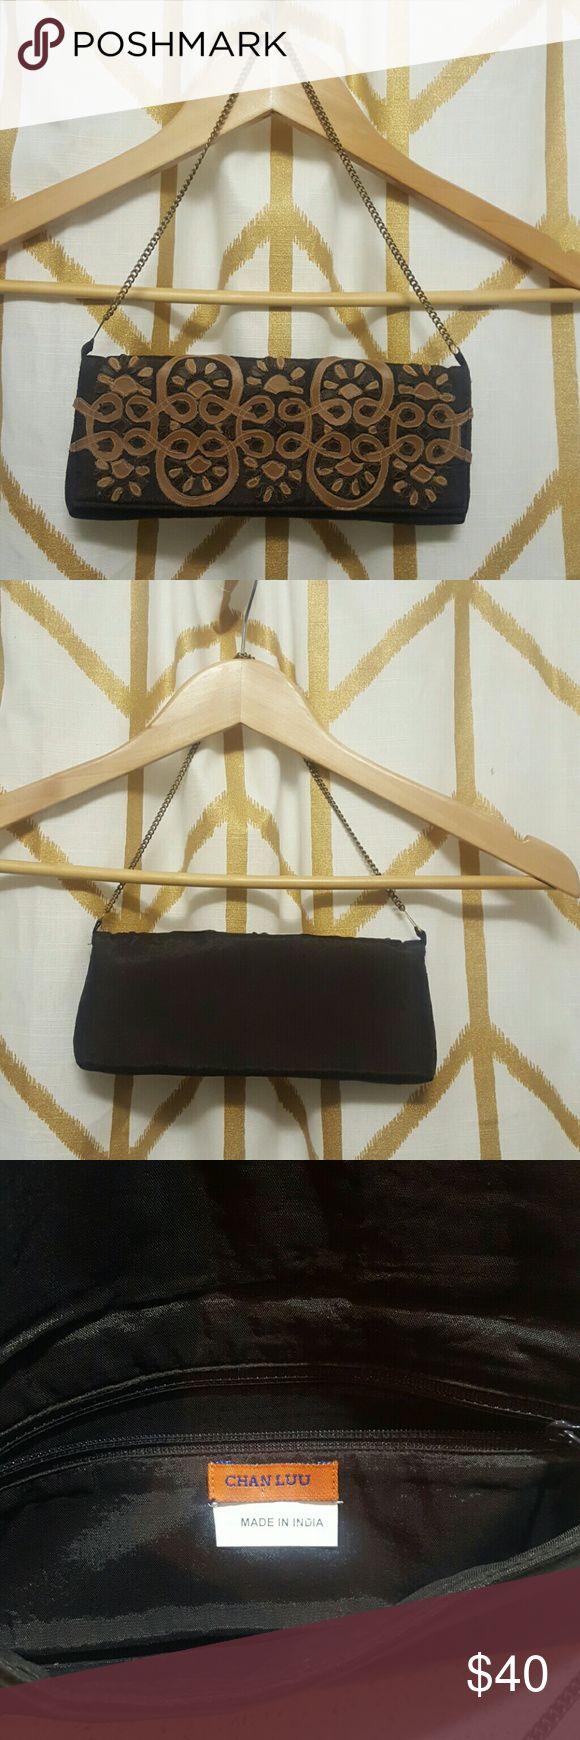 Chan Luu Baguette Canvas baguette with leather details.  Chain strap. Chan Luu Bags Clutches & Wristlets